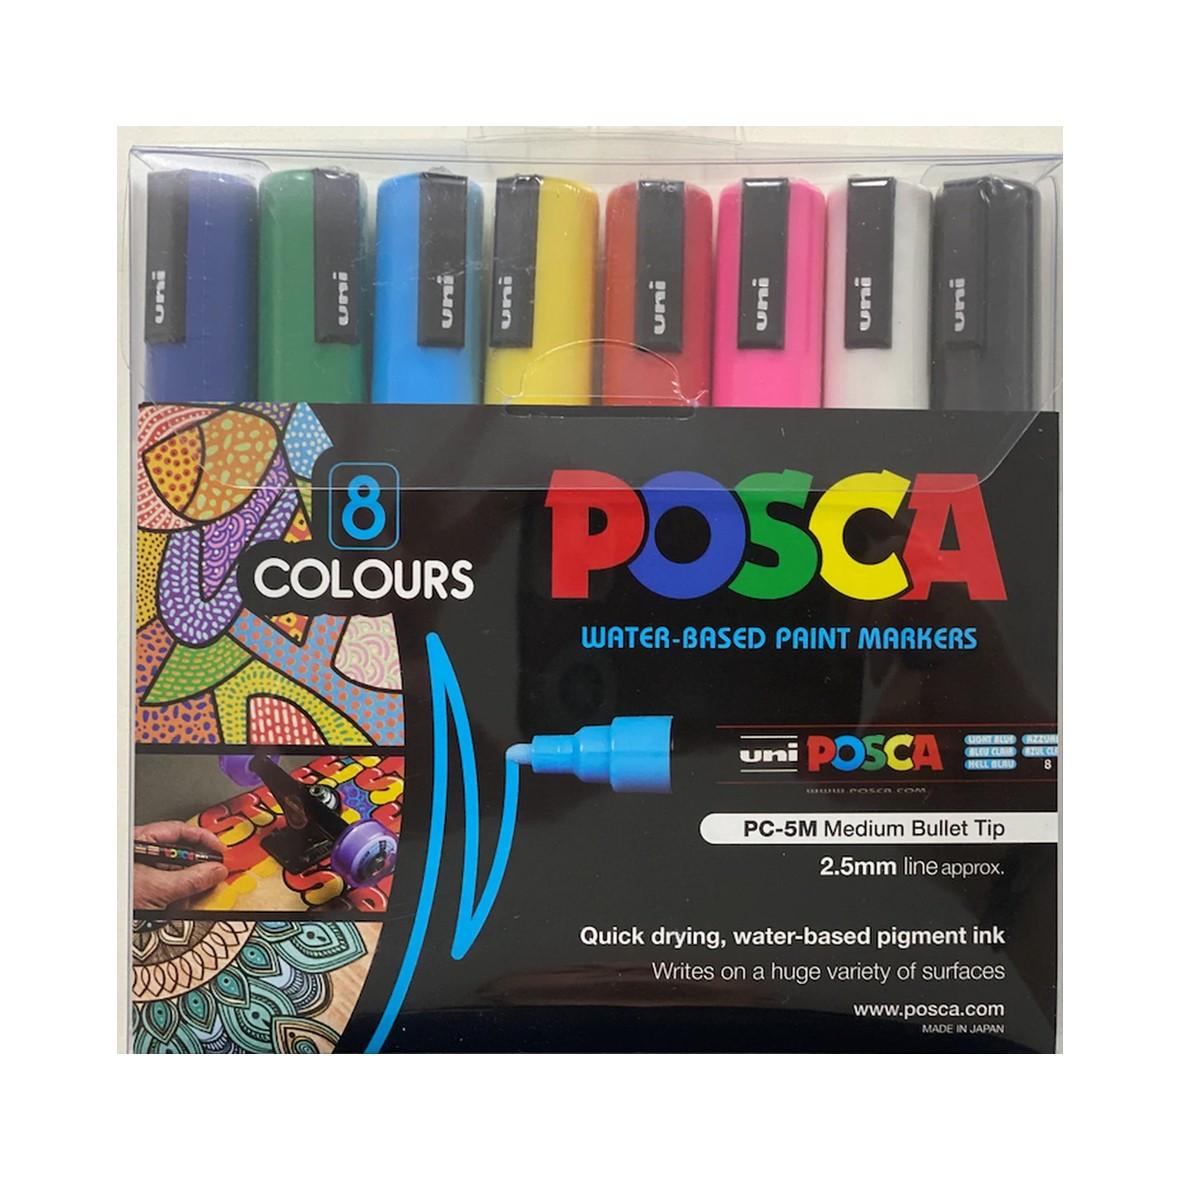 POSCA Marker Set 8 Colours Medium